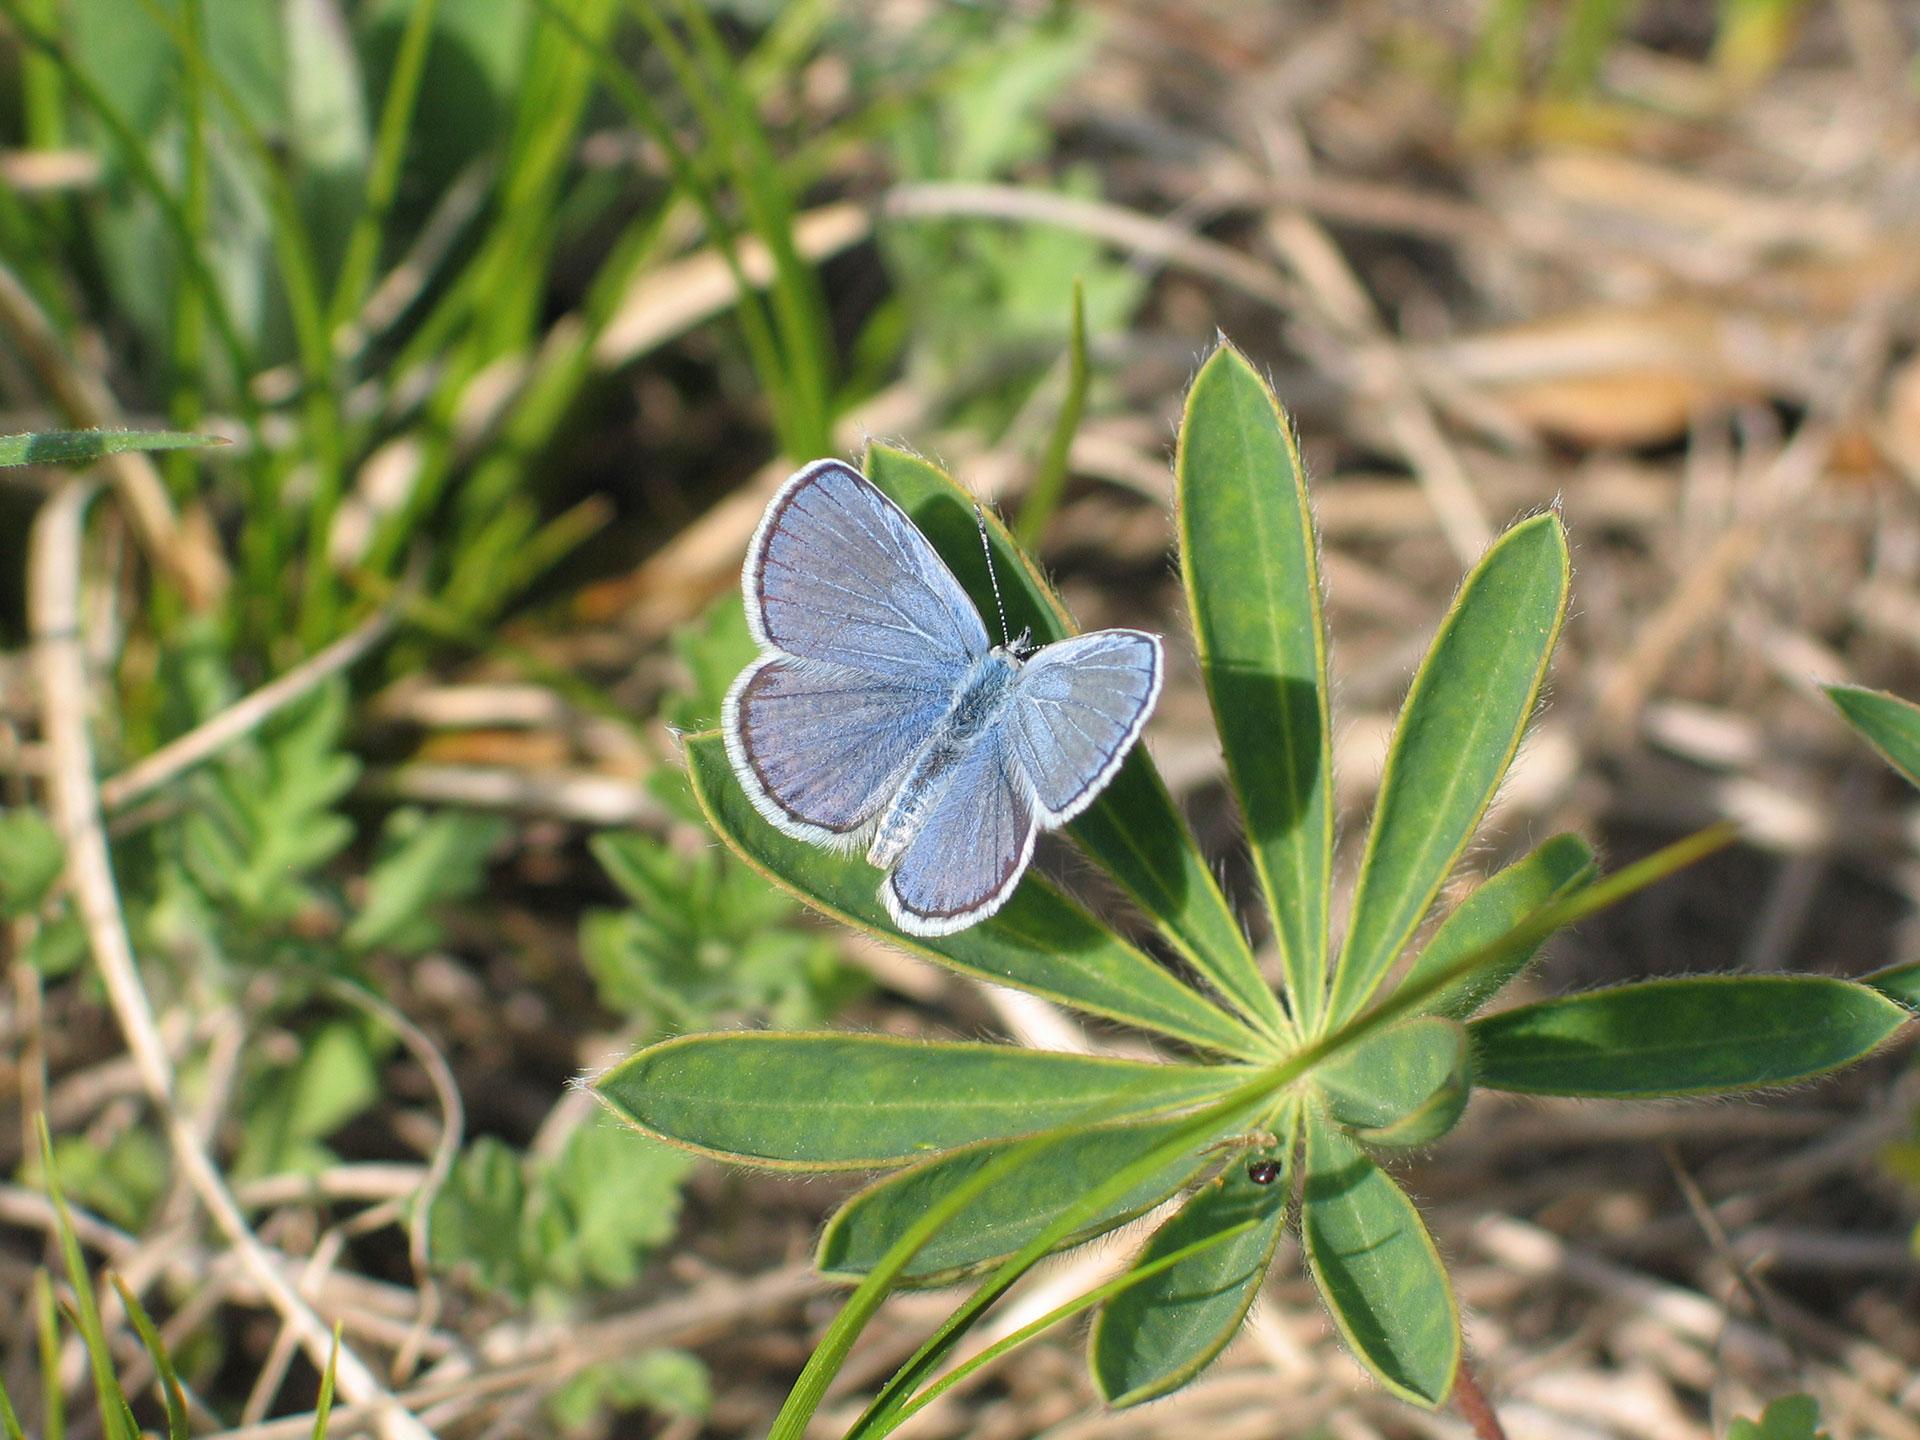 Habitat management allows diverse species to thrive